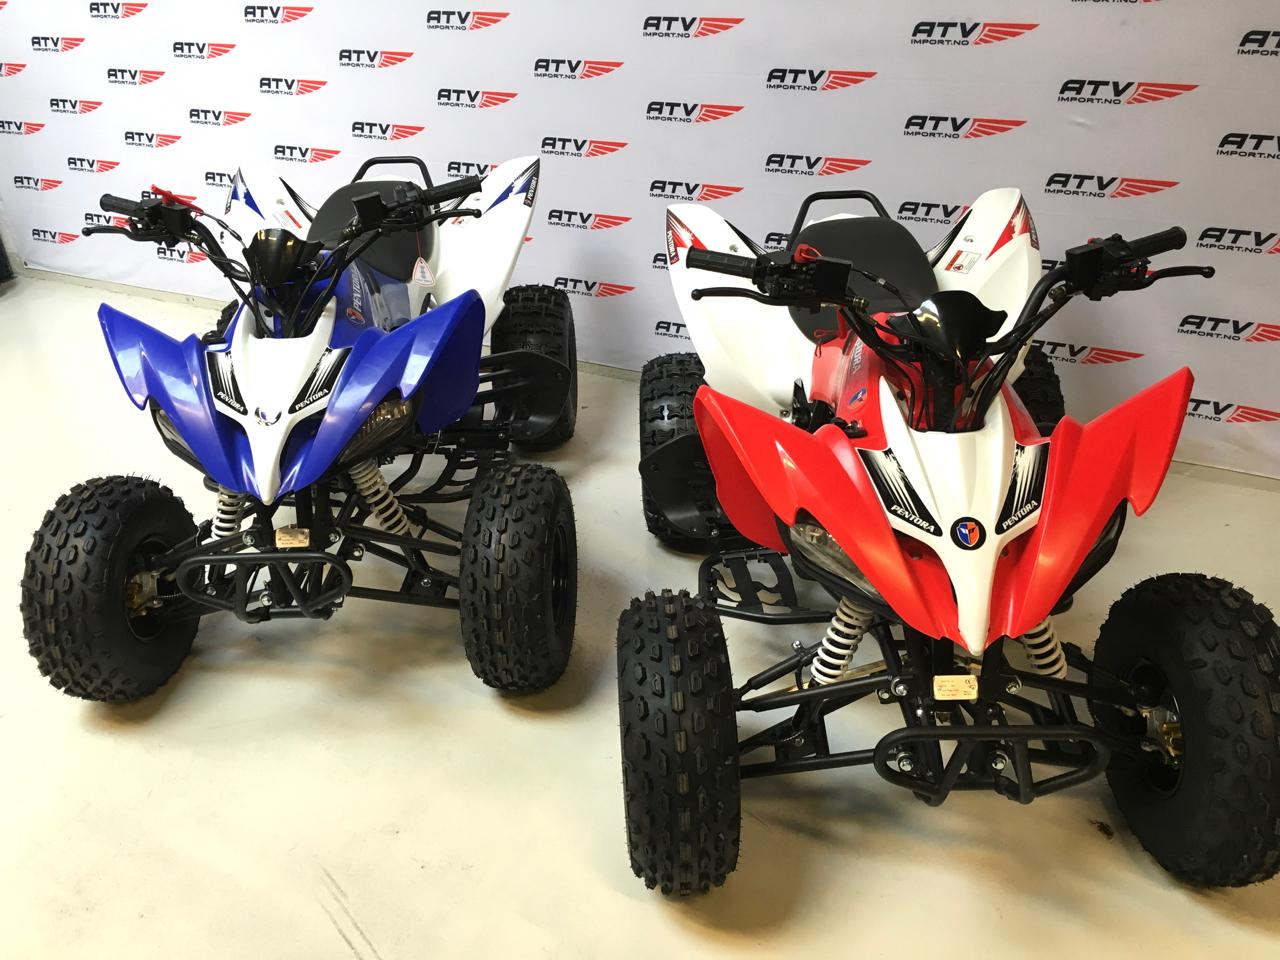 Pentora 125cc stor ungdoms ATV